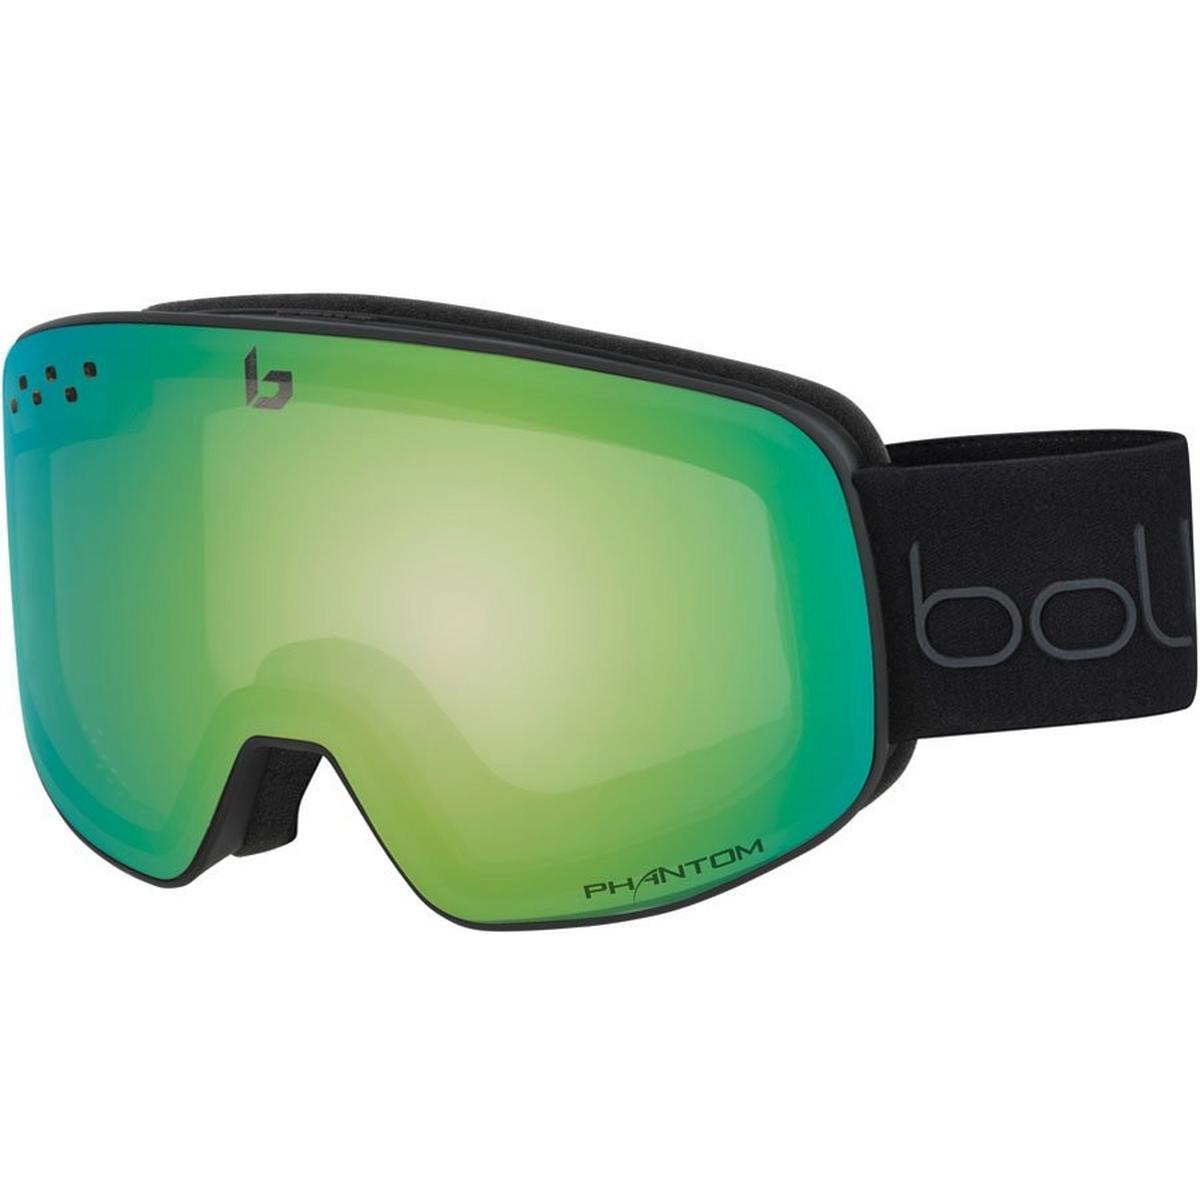 Bolle Men's Nevada Phantom Green Goggles